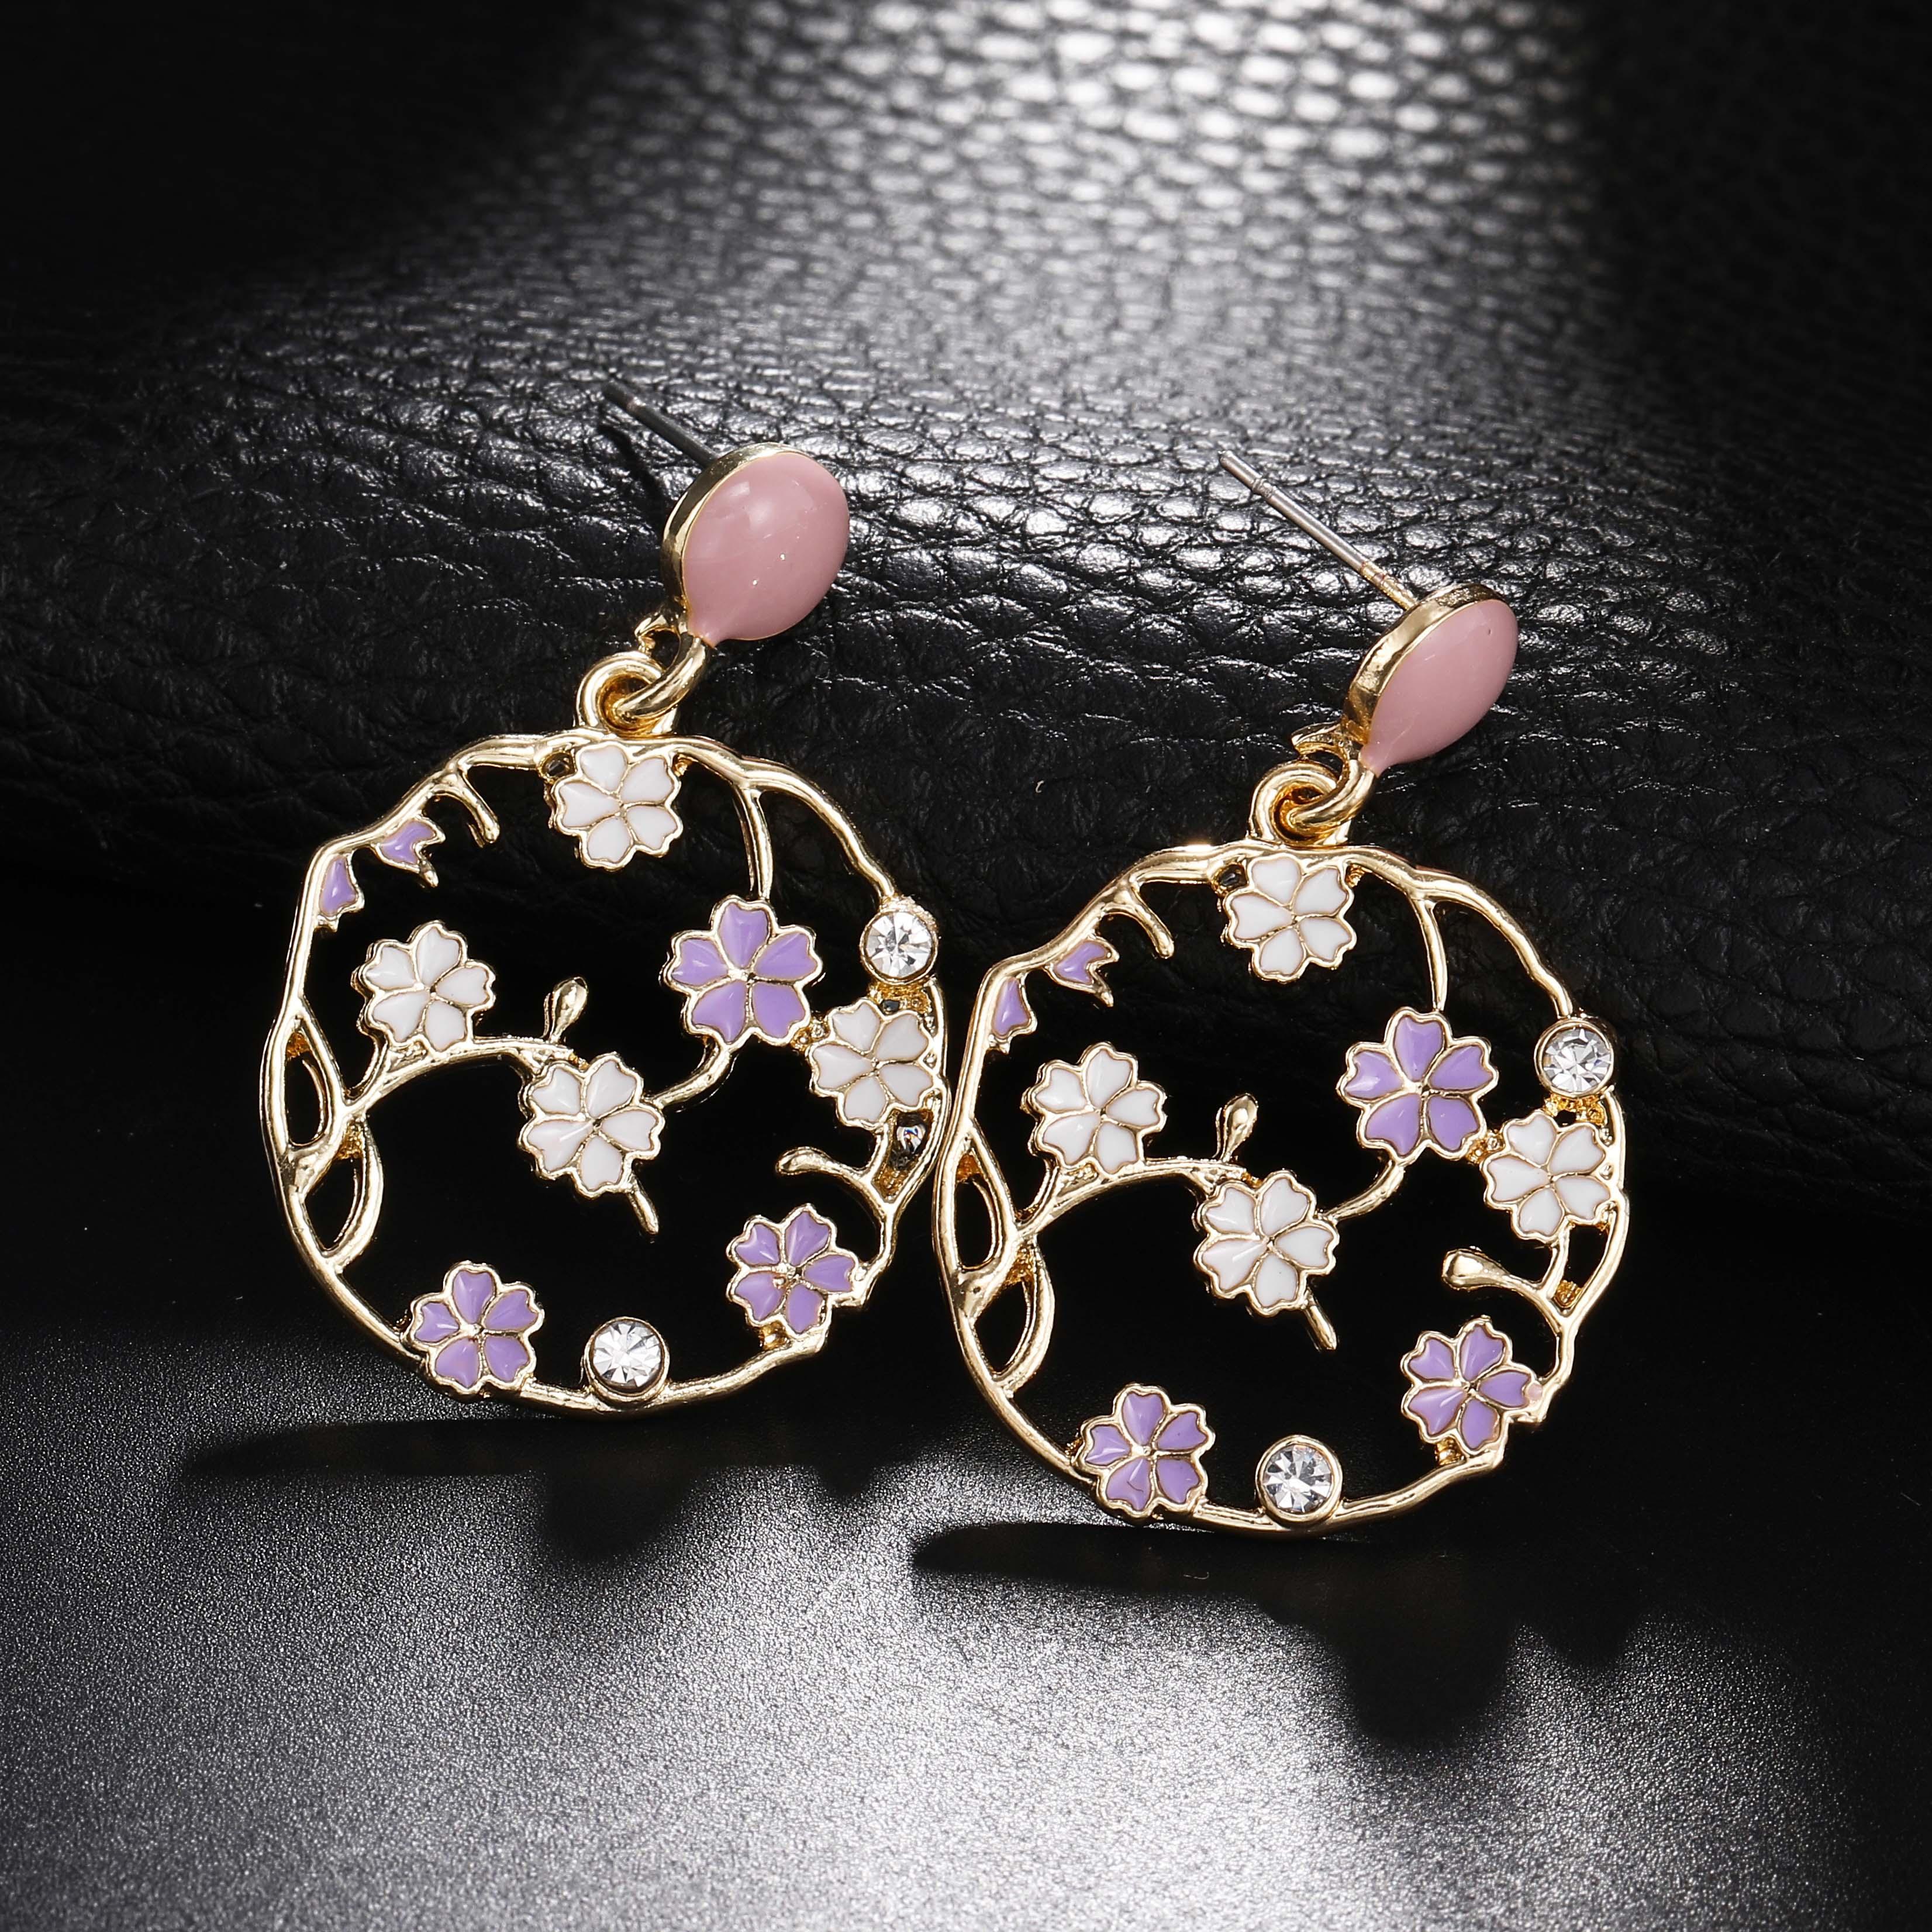 2019 New Arrival Trendy Jewelry Round Geometric Earrings Korean Stlye Pink Purple Drop Earrings Temperament